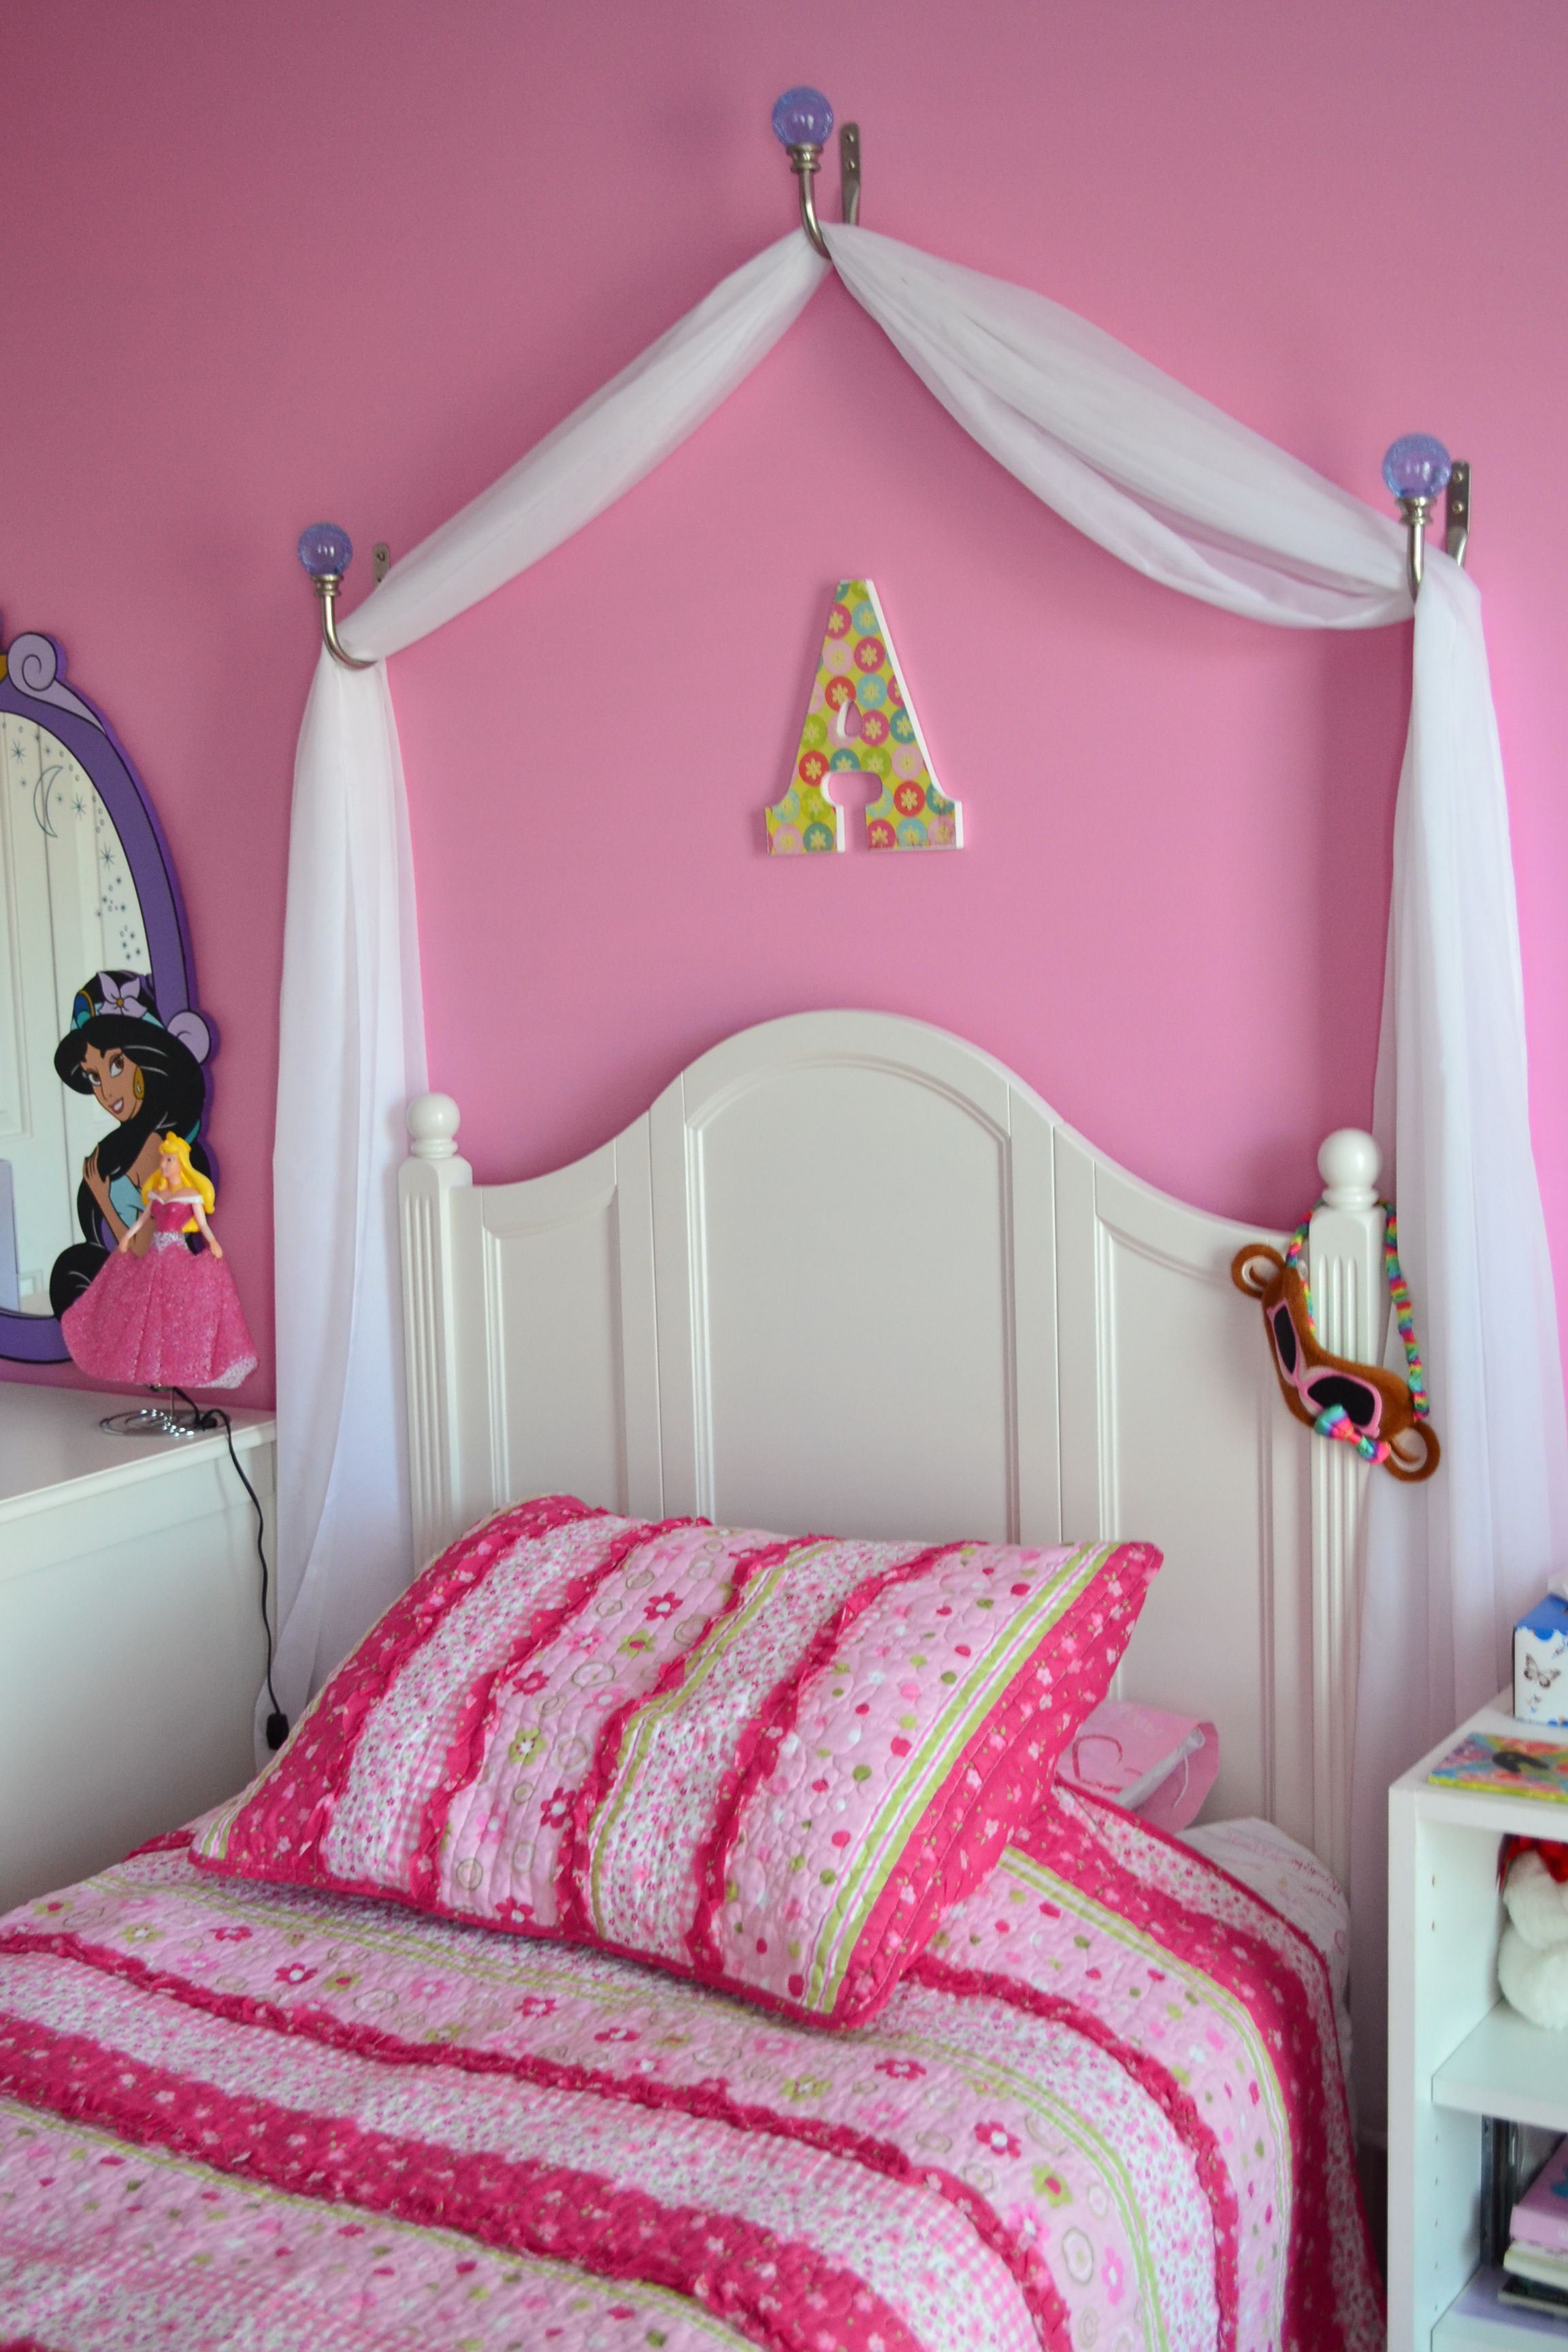 Creating A Disney Princess Room On A Budget Princess Room